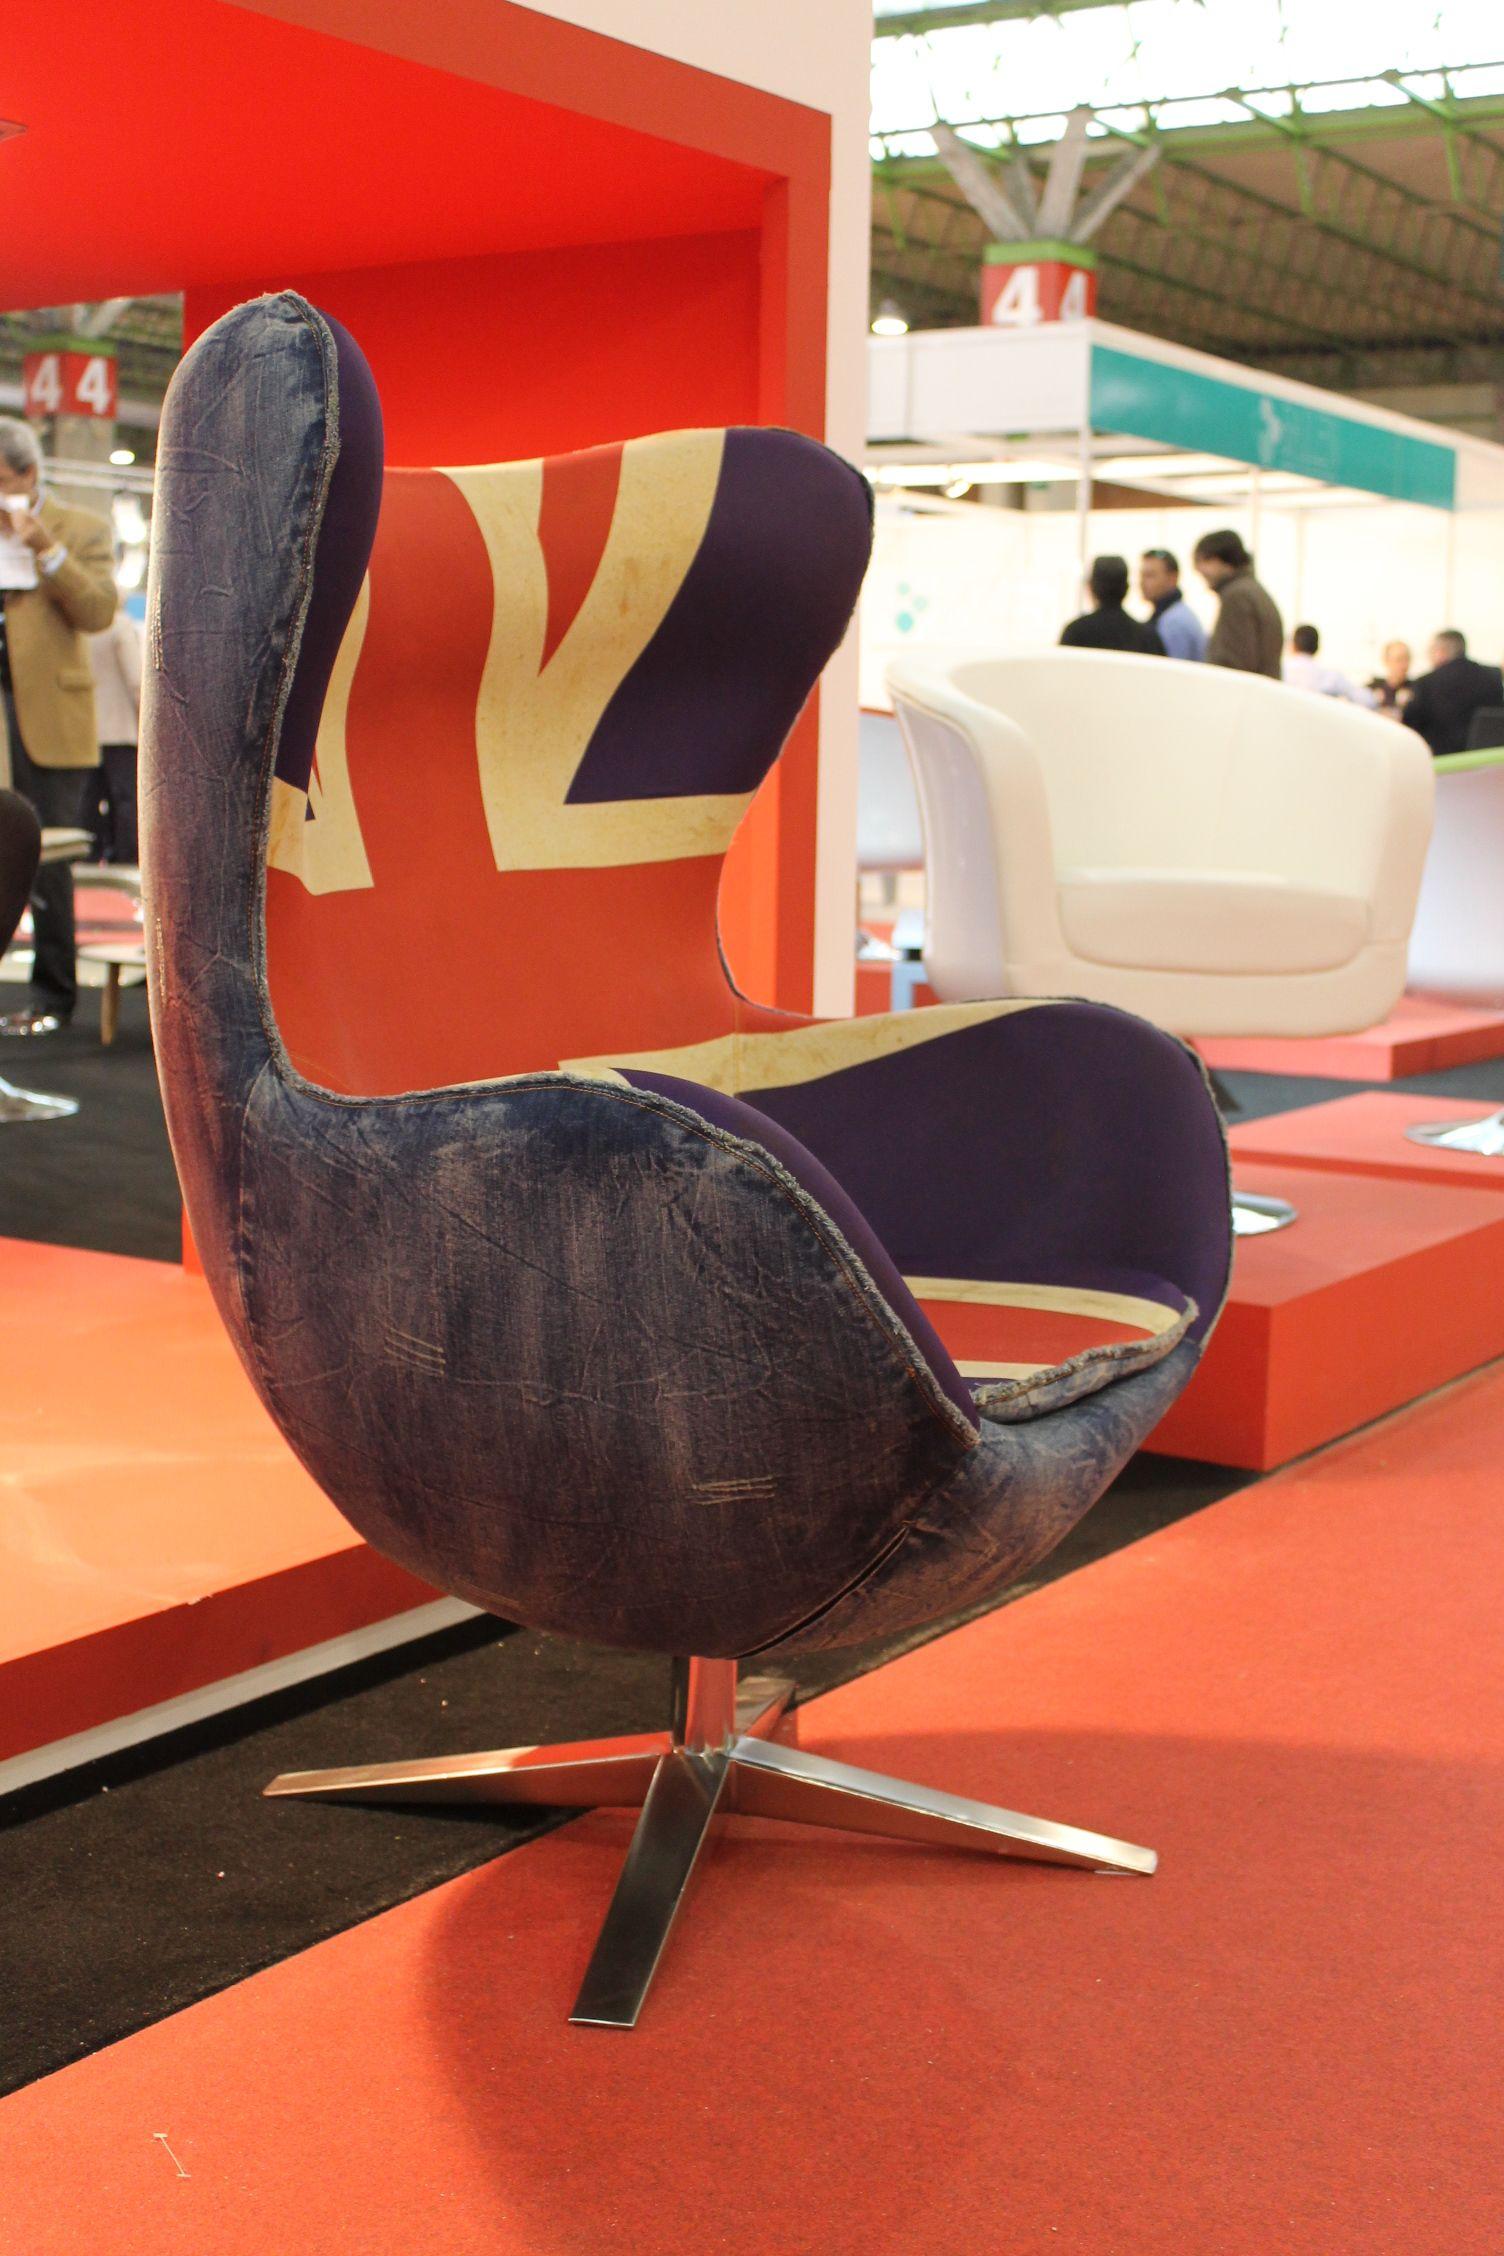 Sillon Egg Arne Jacobsen Feria Del Mueble De Zaragoza Ferias  # Muebles Rupema Najera